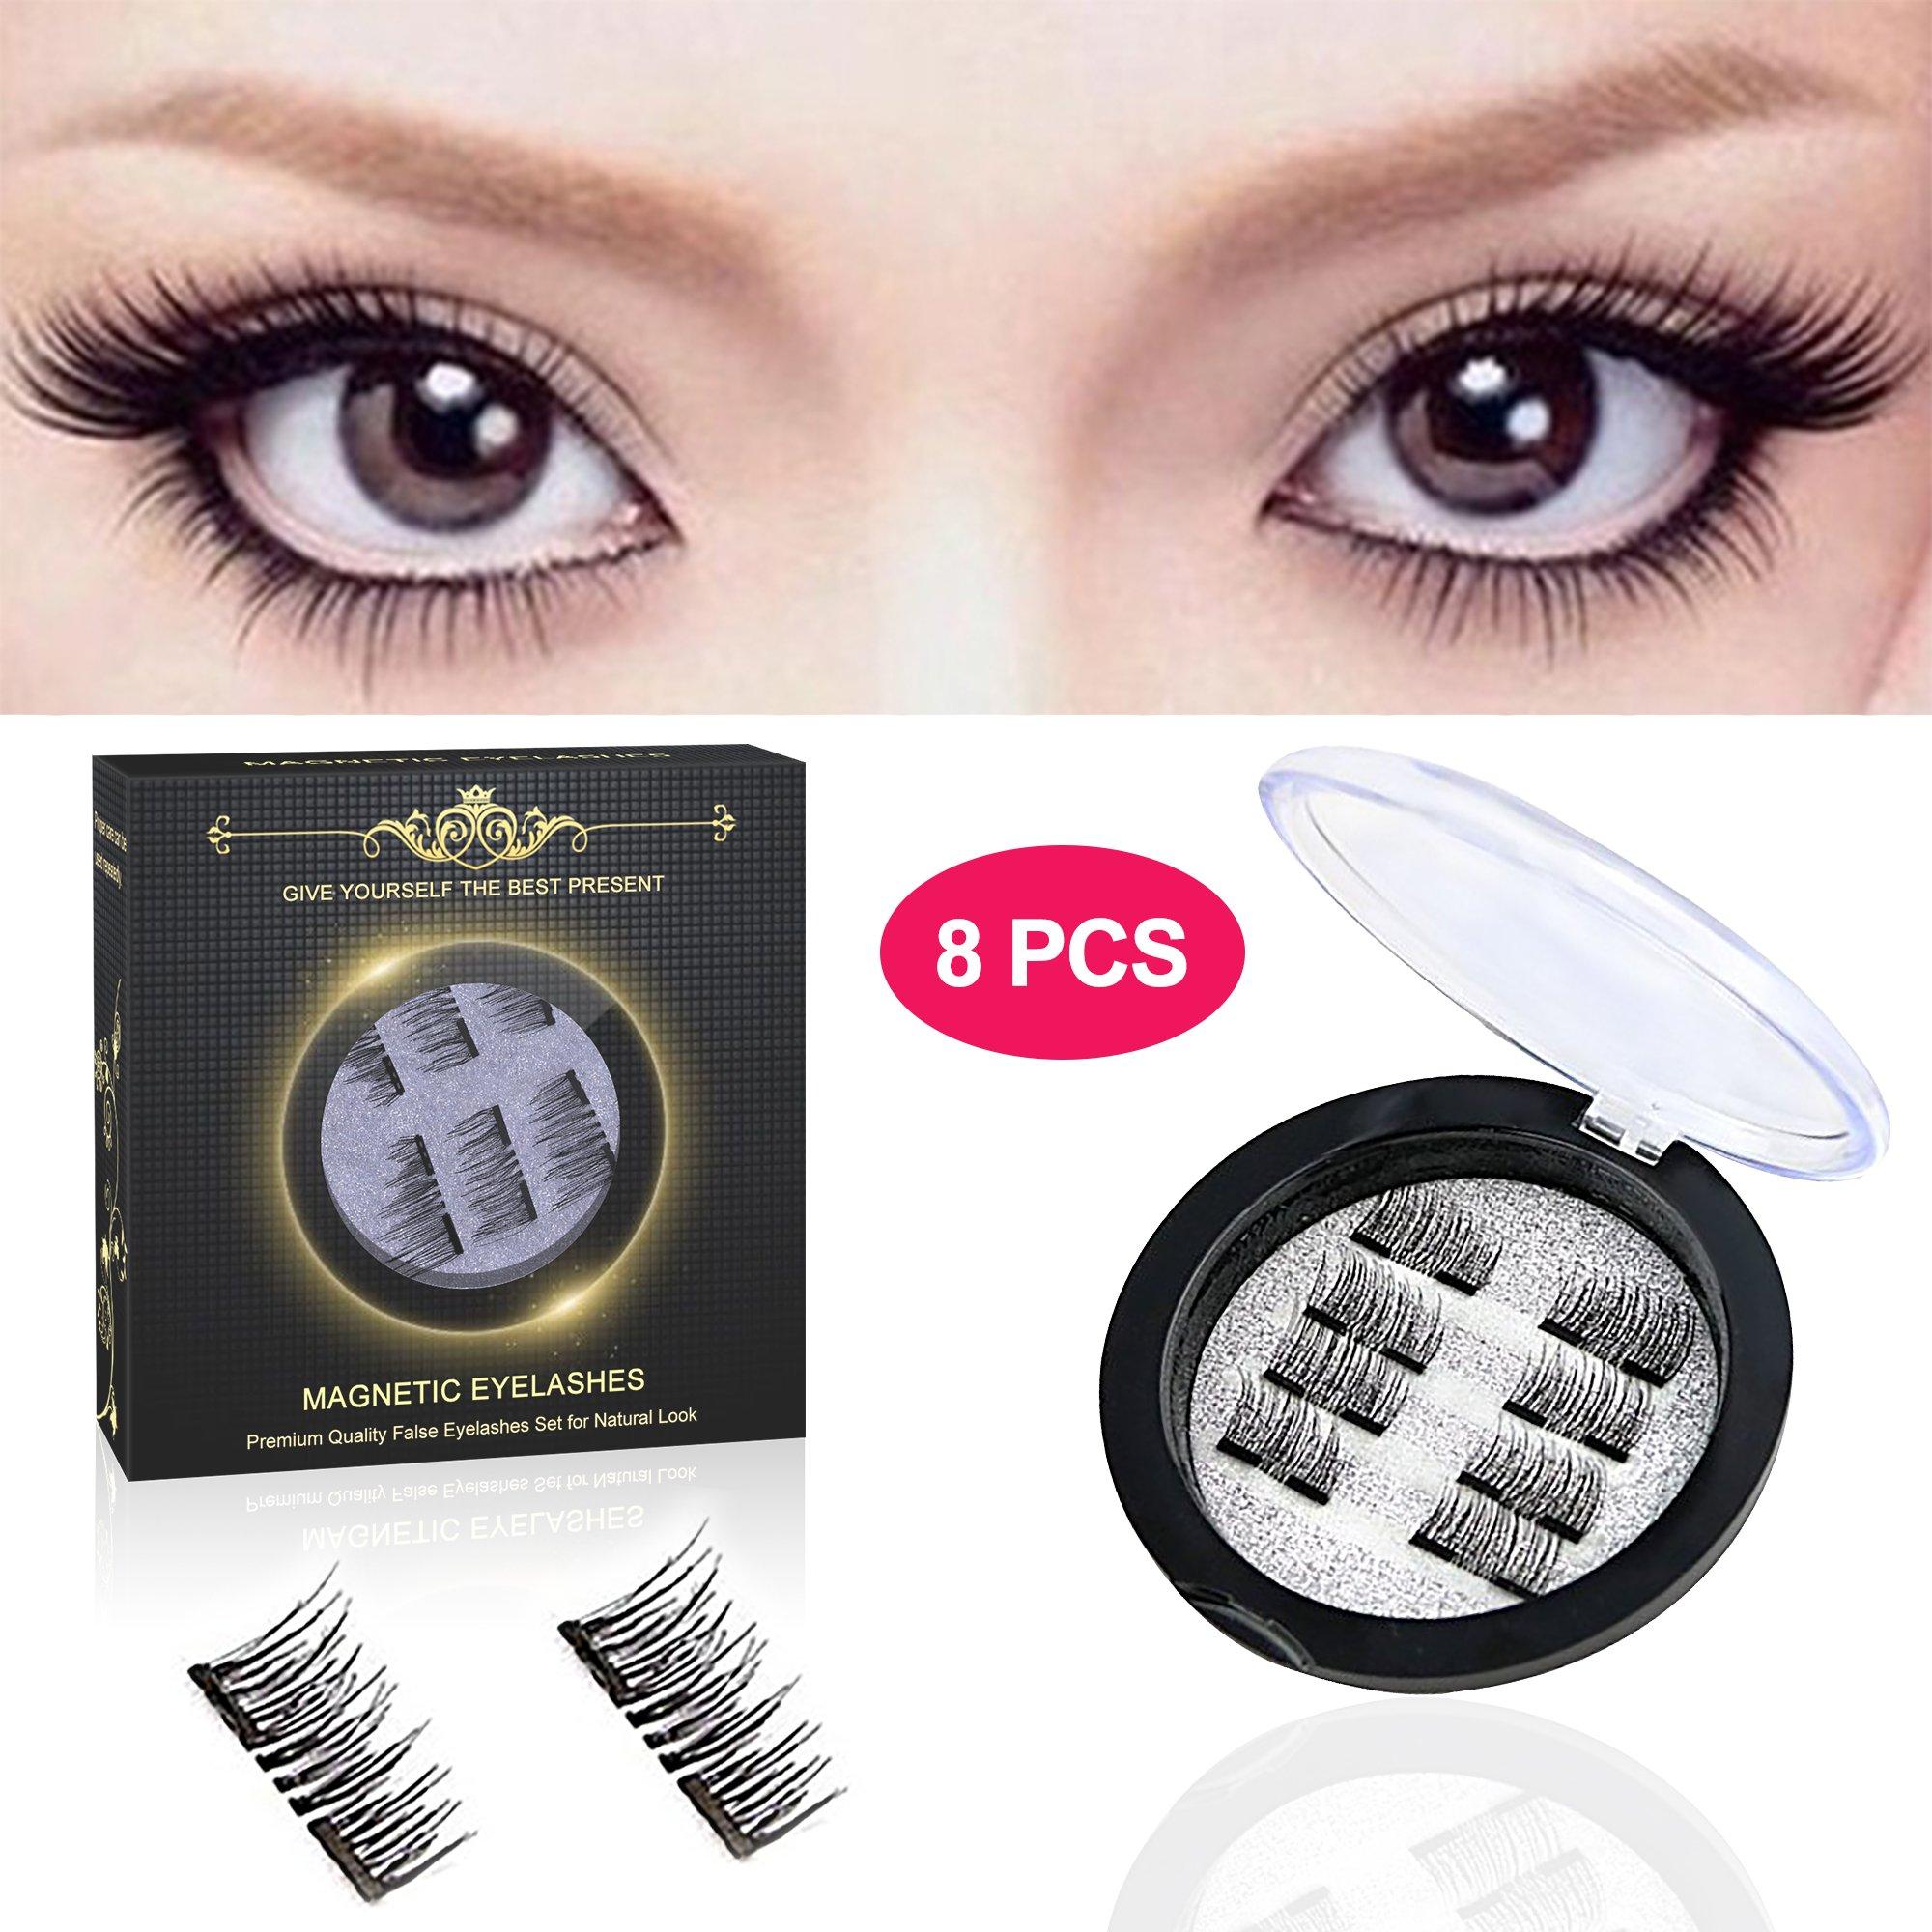 Magnetic Eyelashes -Pack of 8 pcs, Magnetic False Eyelashes for Women, False Eyelashes Set for Natural Look, Ultra Thin 3D Fiber Reusable Fake Eyelashes Extension (Black)